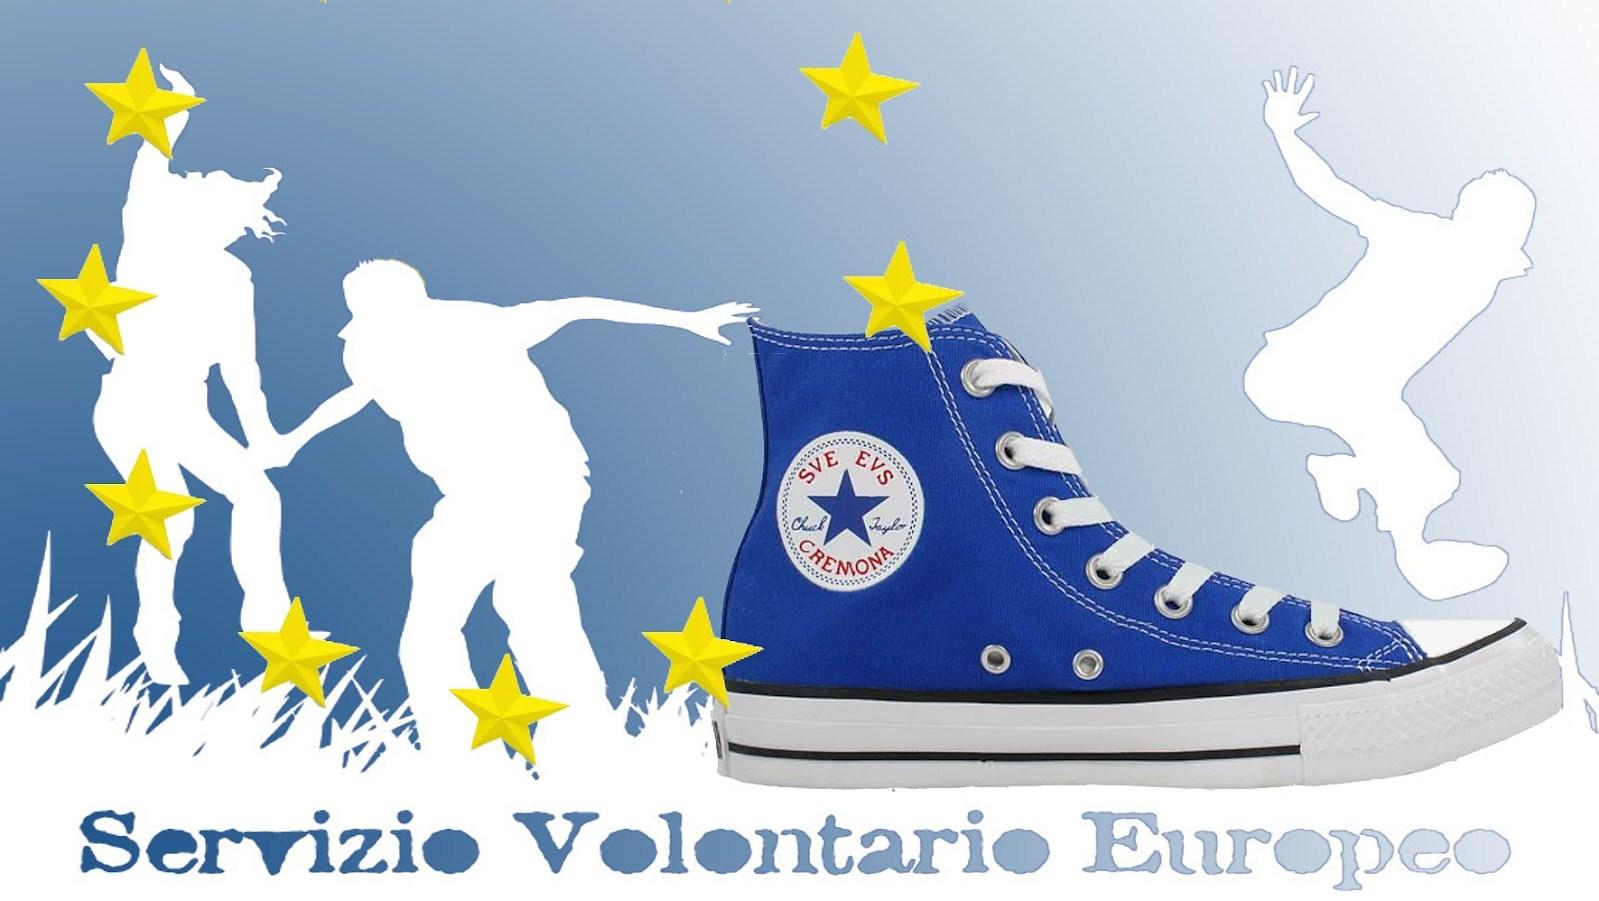 sve evs servizio volontario europeo